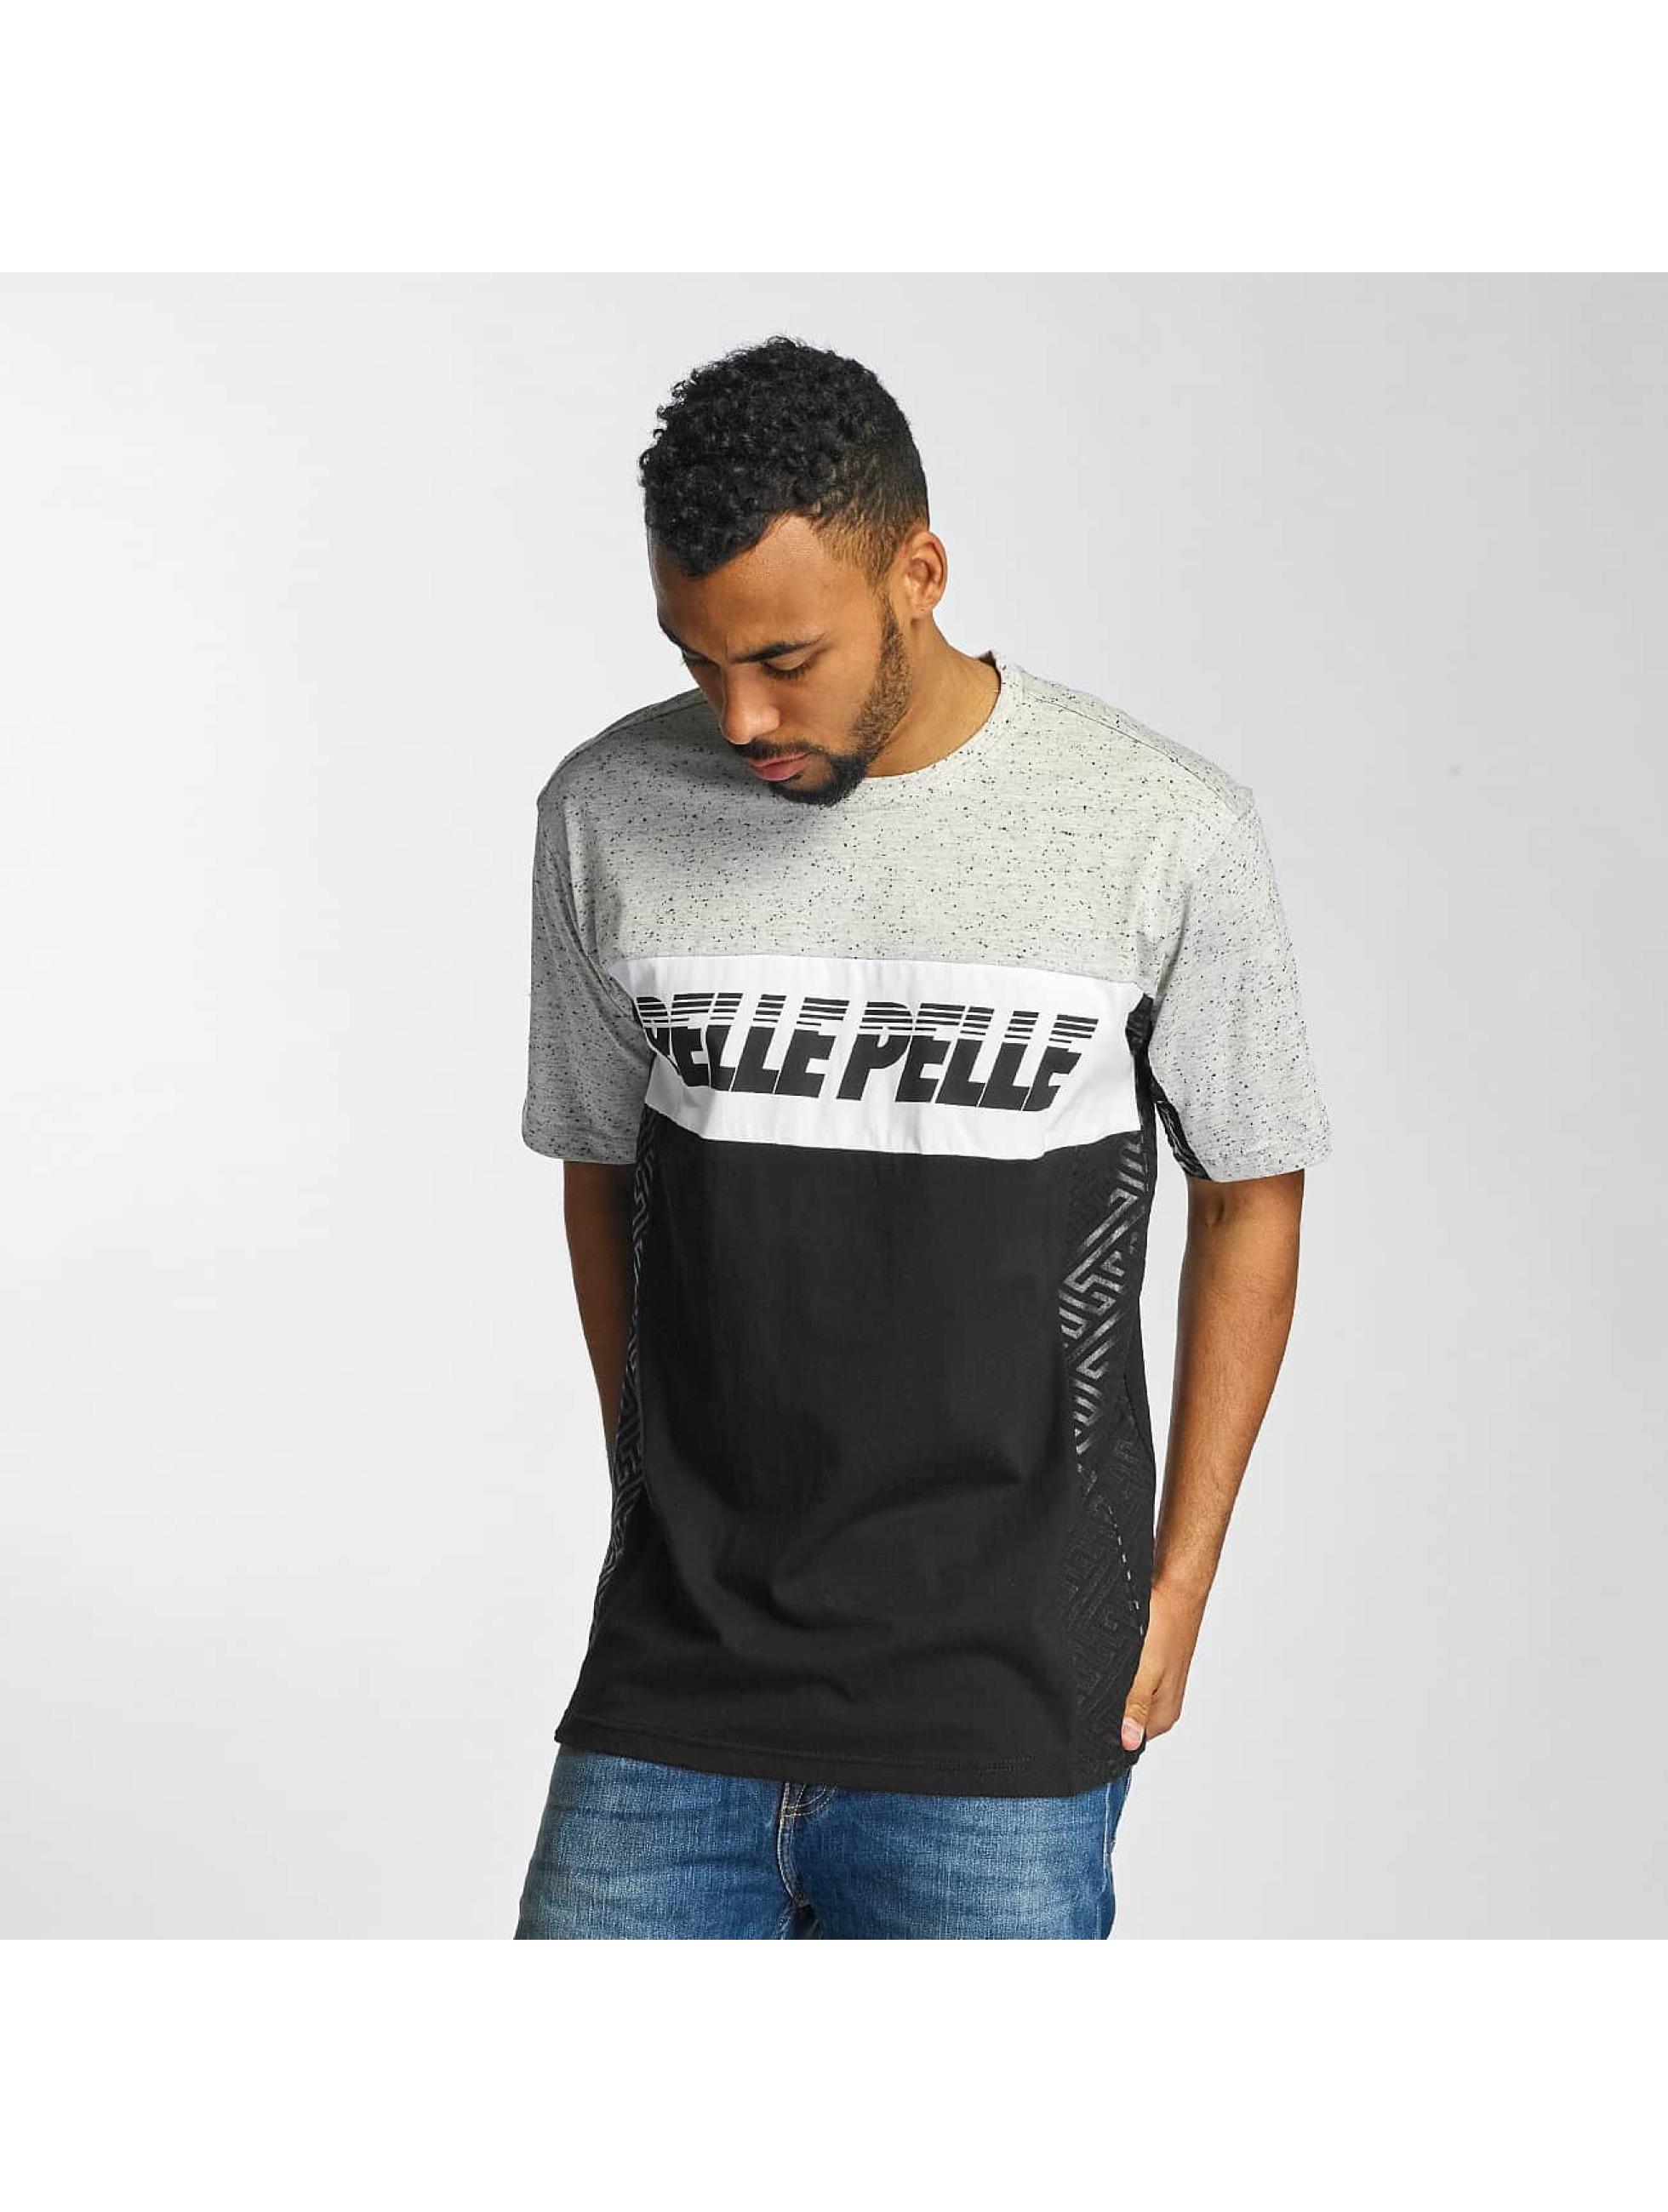 Pelle Pelle Männer T-Shirt Sayagata Block in schwarz